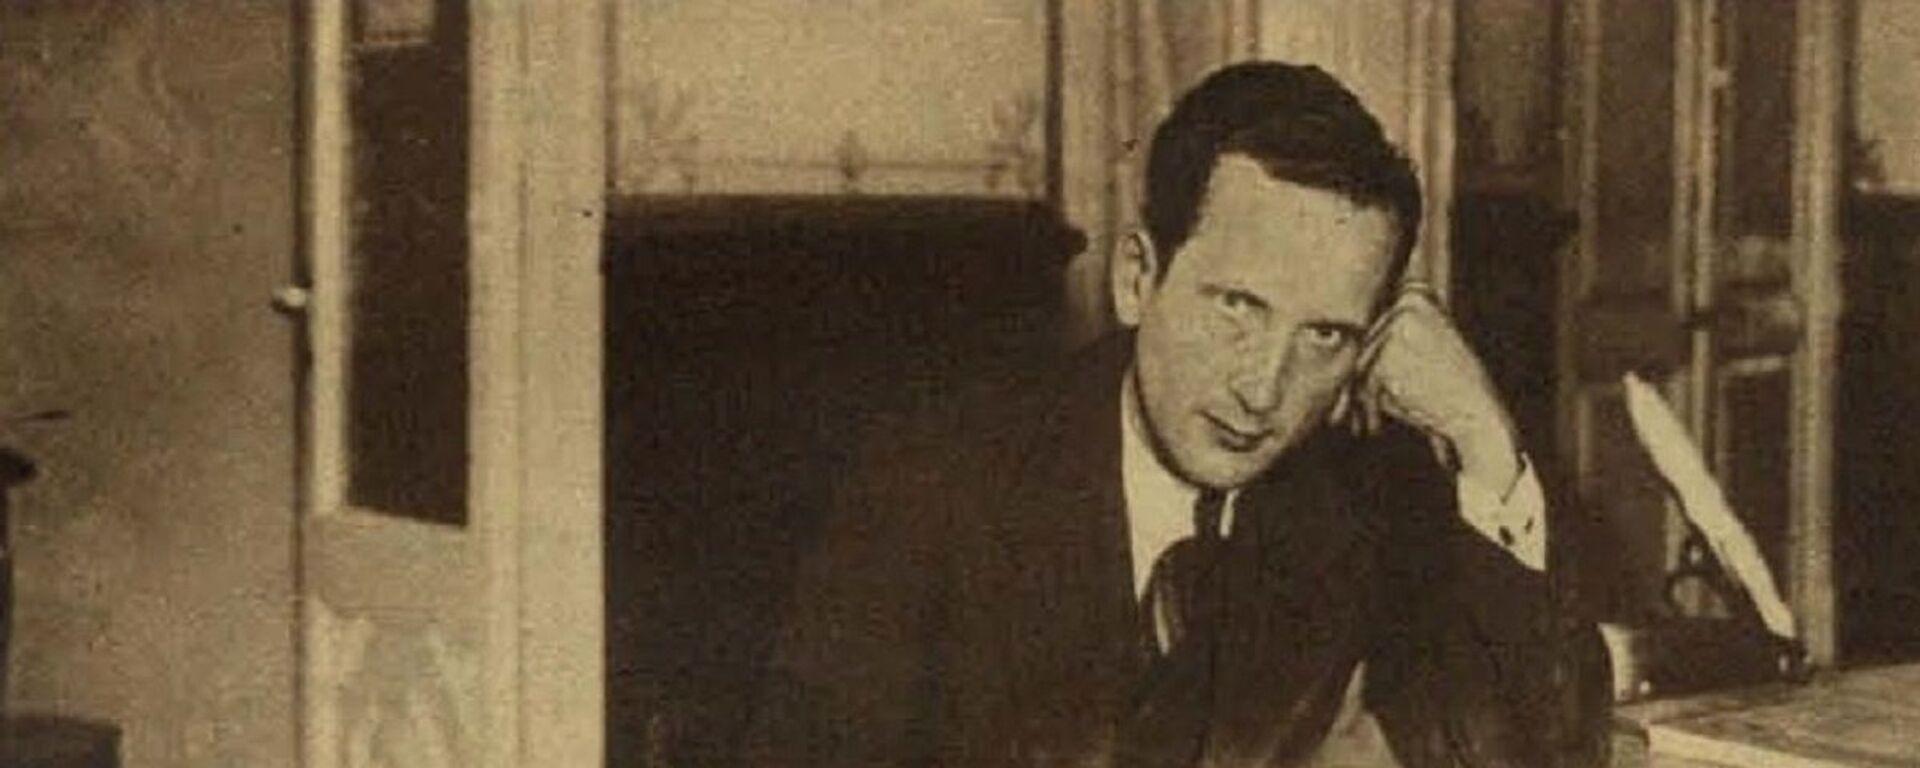 Boris Skósirev en el hotel Mundial de Seo de Urgel, en España - Sputnik Mundo, 1920, 25.01.2021